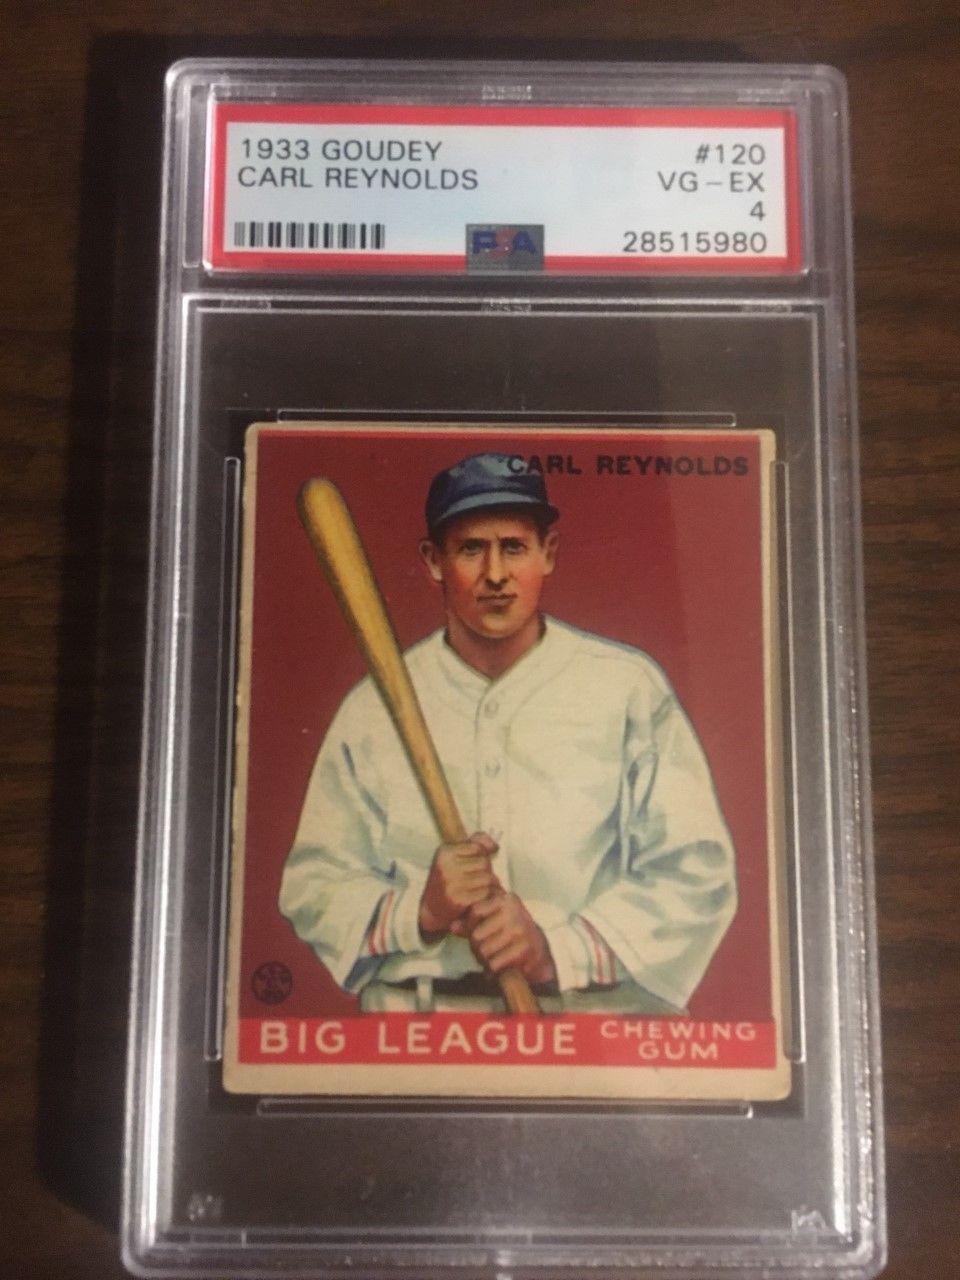 1933 GOUDEY Carl Reynolds 120 PSA 4 St. Louis Browns